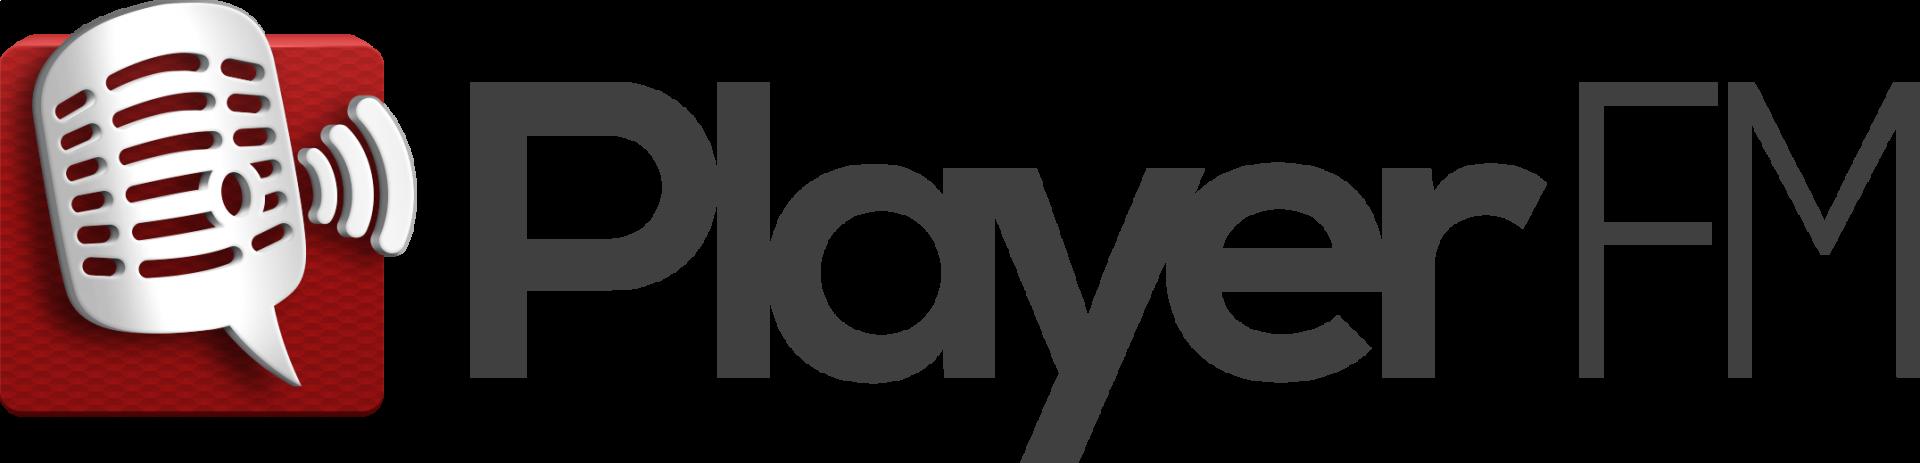 Image result for player.fm logo